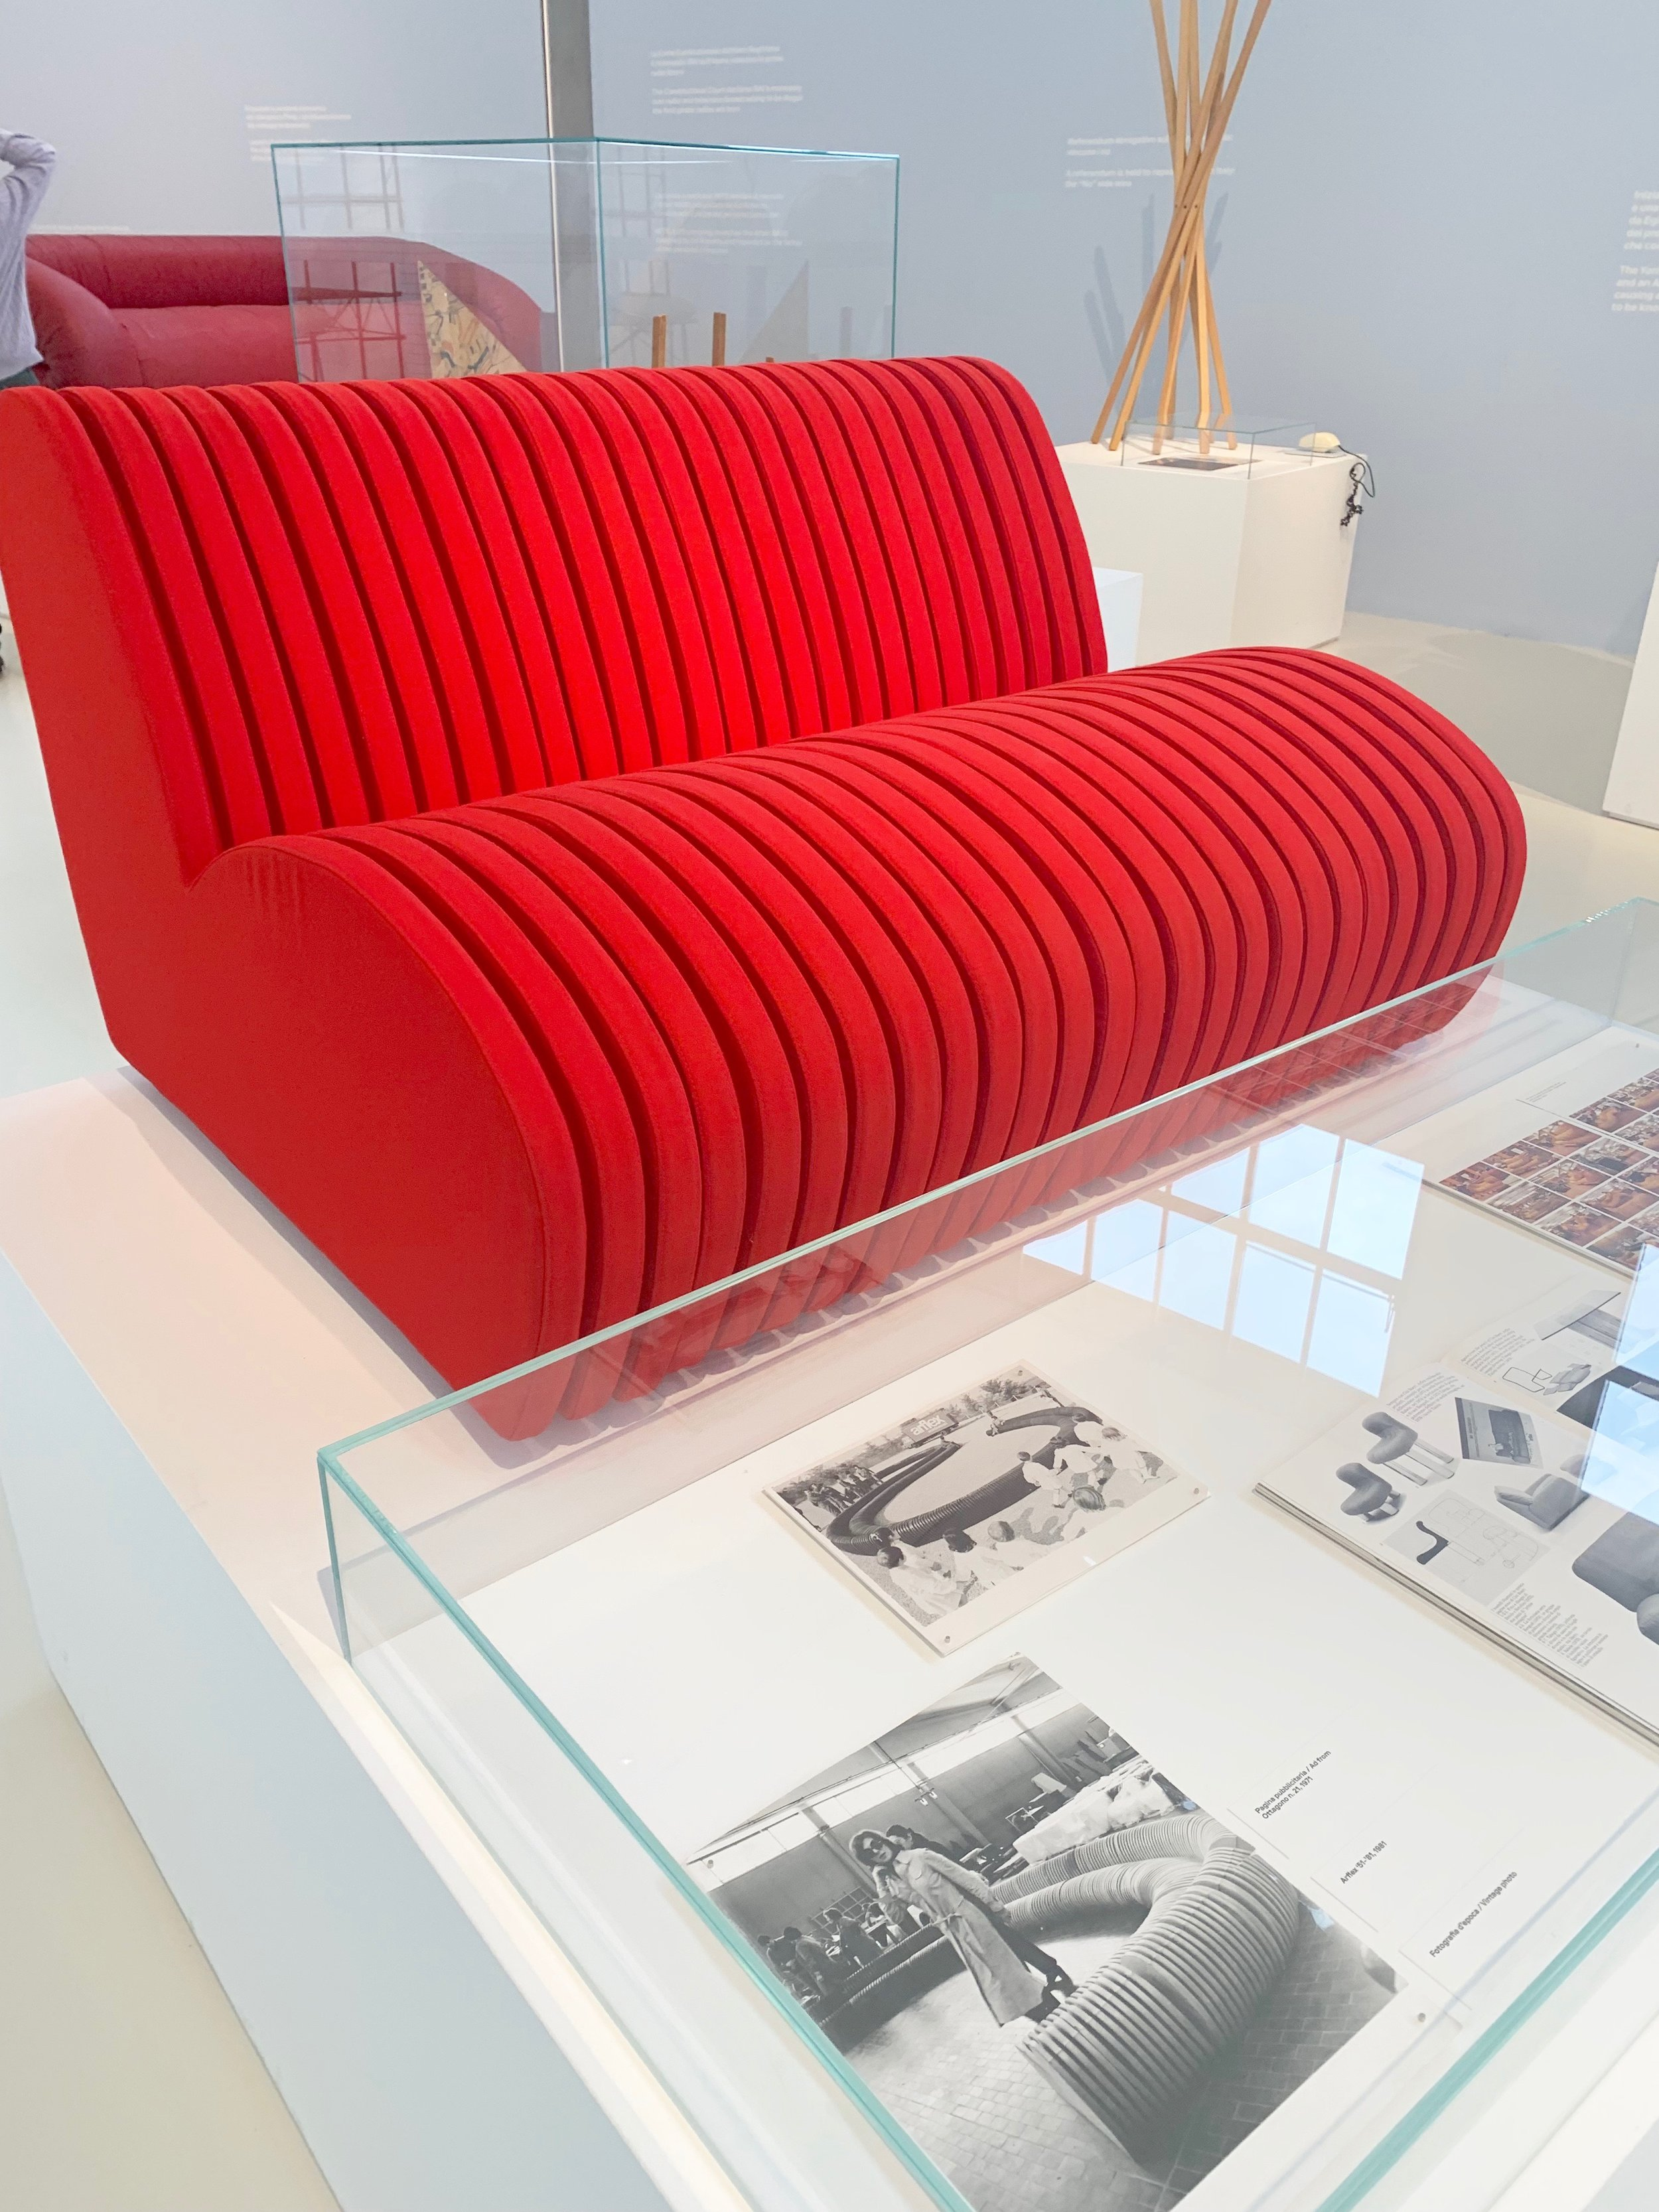 Museum Of Italian Design - Italian Mid Century Modern Furniture Designitalia00041.jpeg